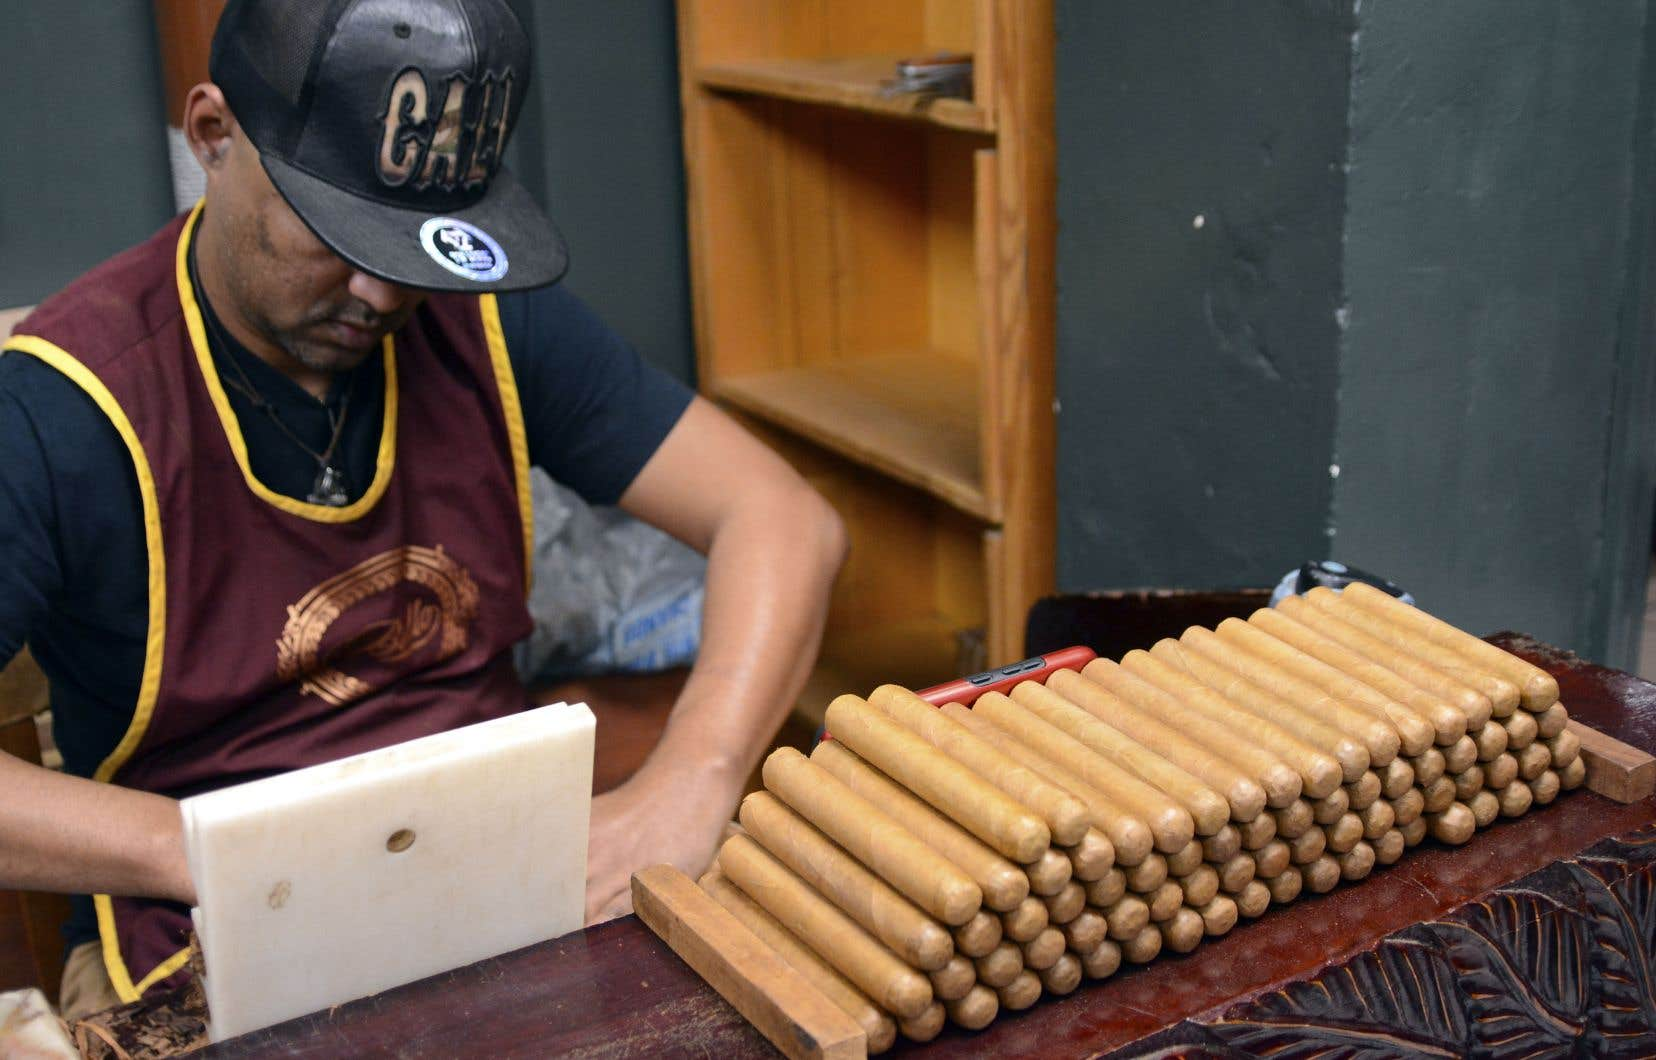 Confection de cigares par des mains expertes dans la Calle Ocho de Miami.